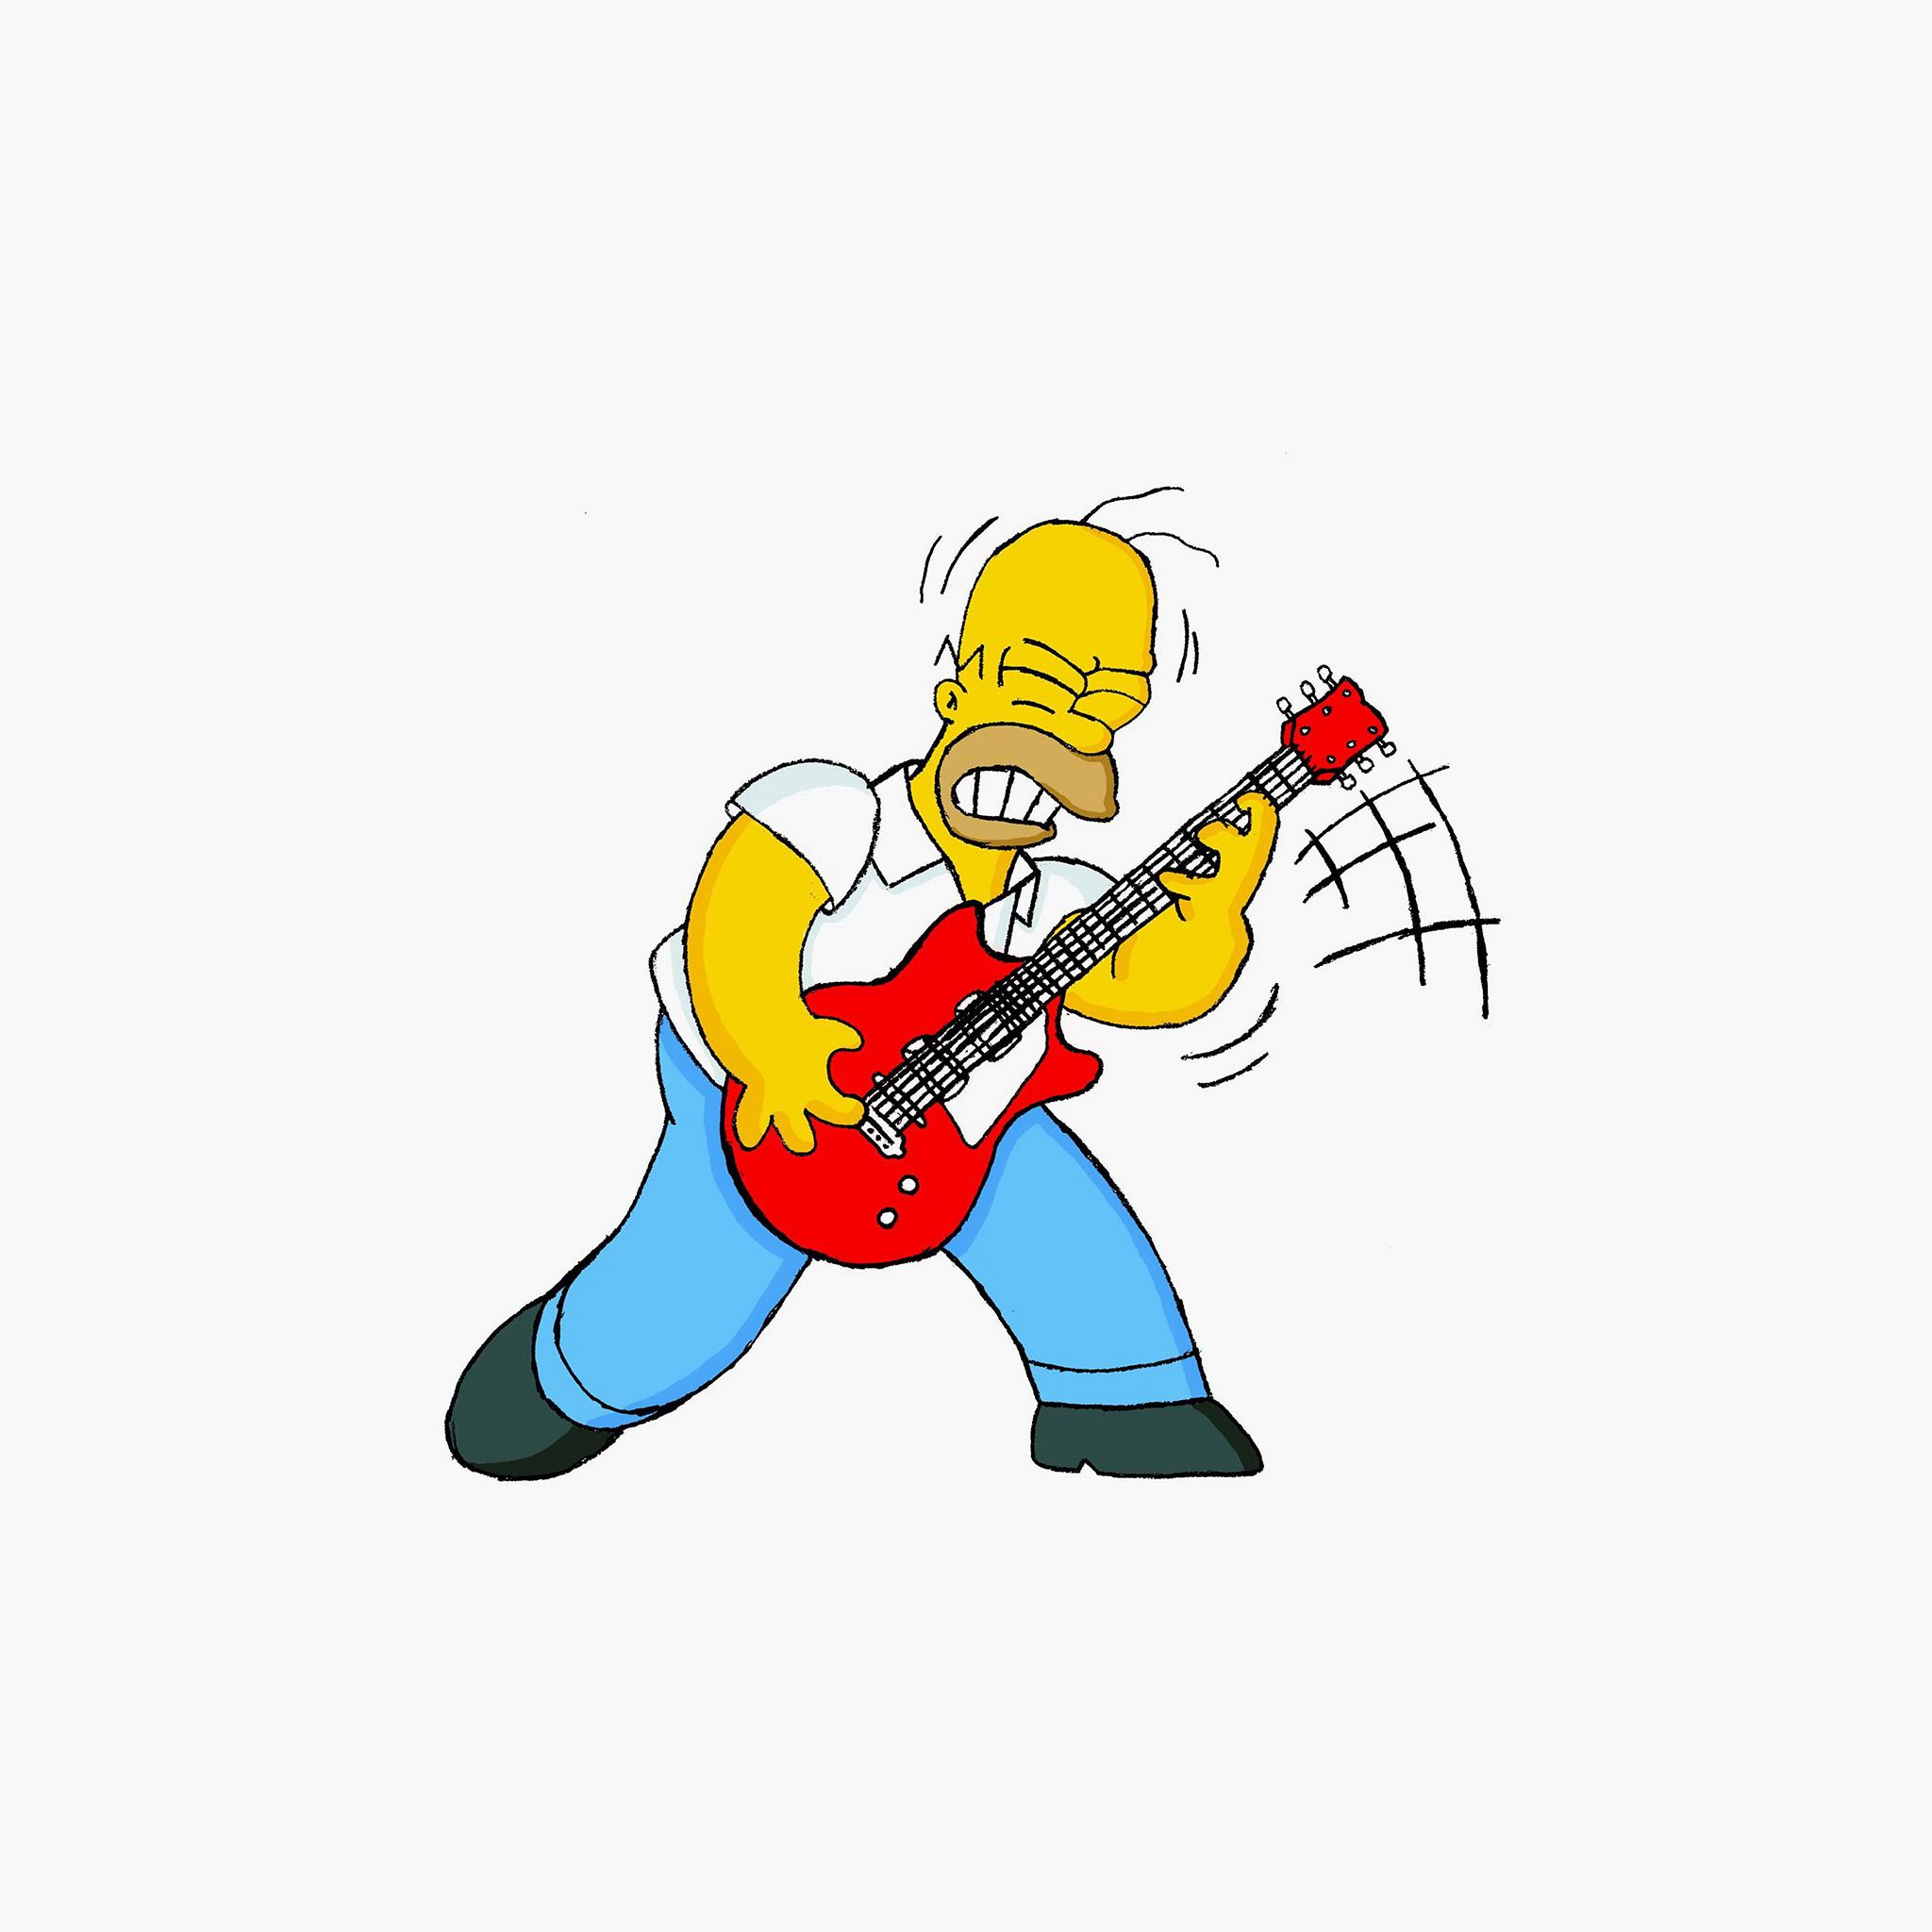 Rick And Morty Wallpaper Iphone Au45 Homer Simpson Guitar Cartoon Illustration Art Wallpaper